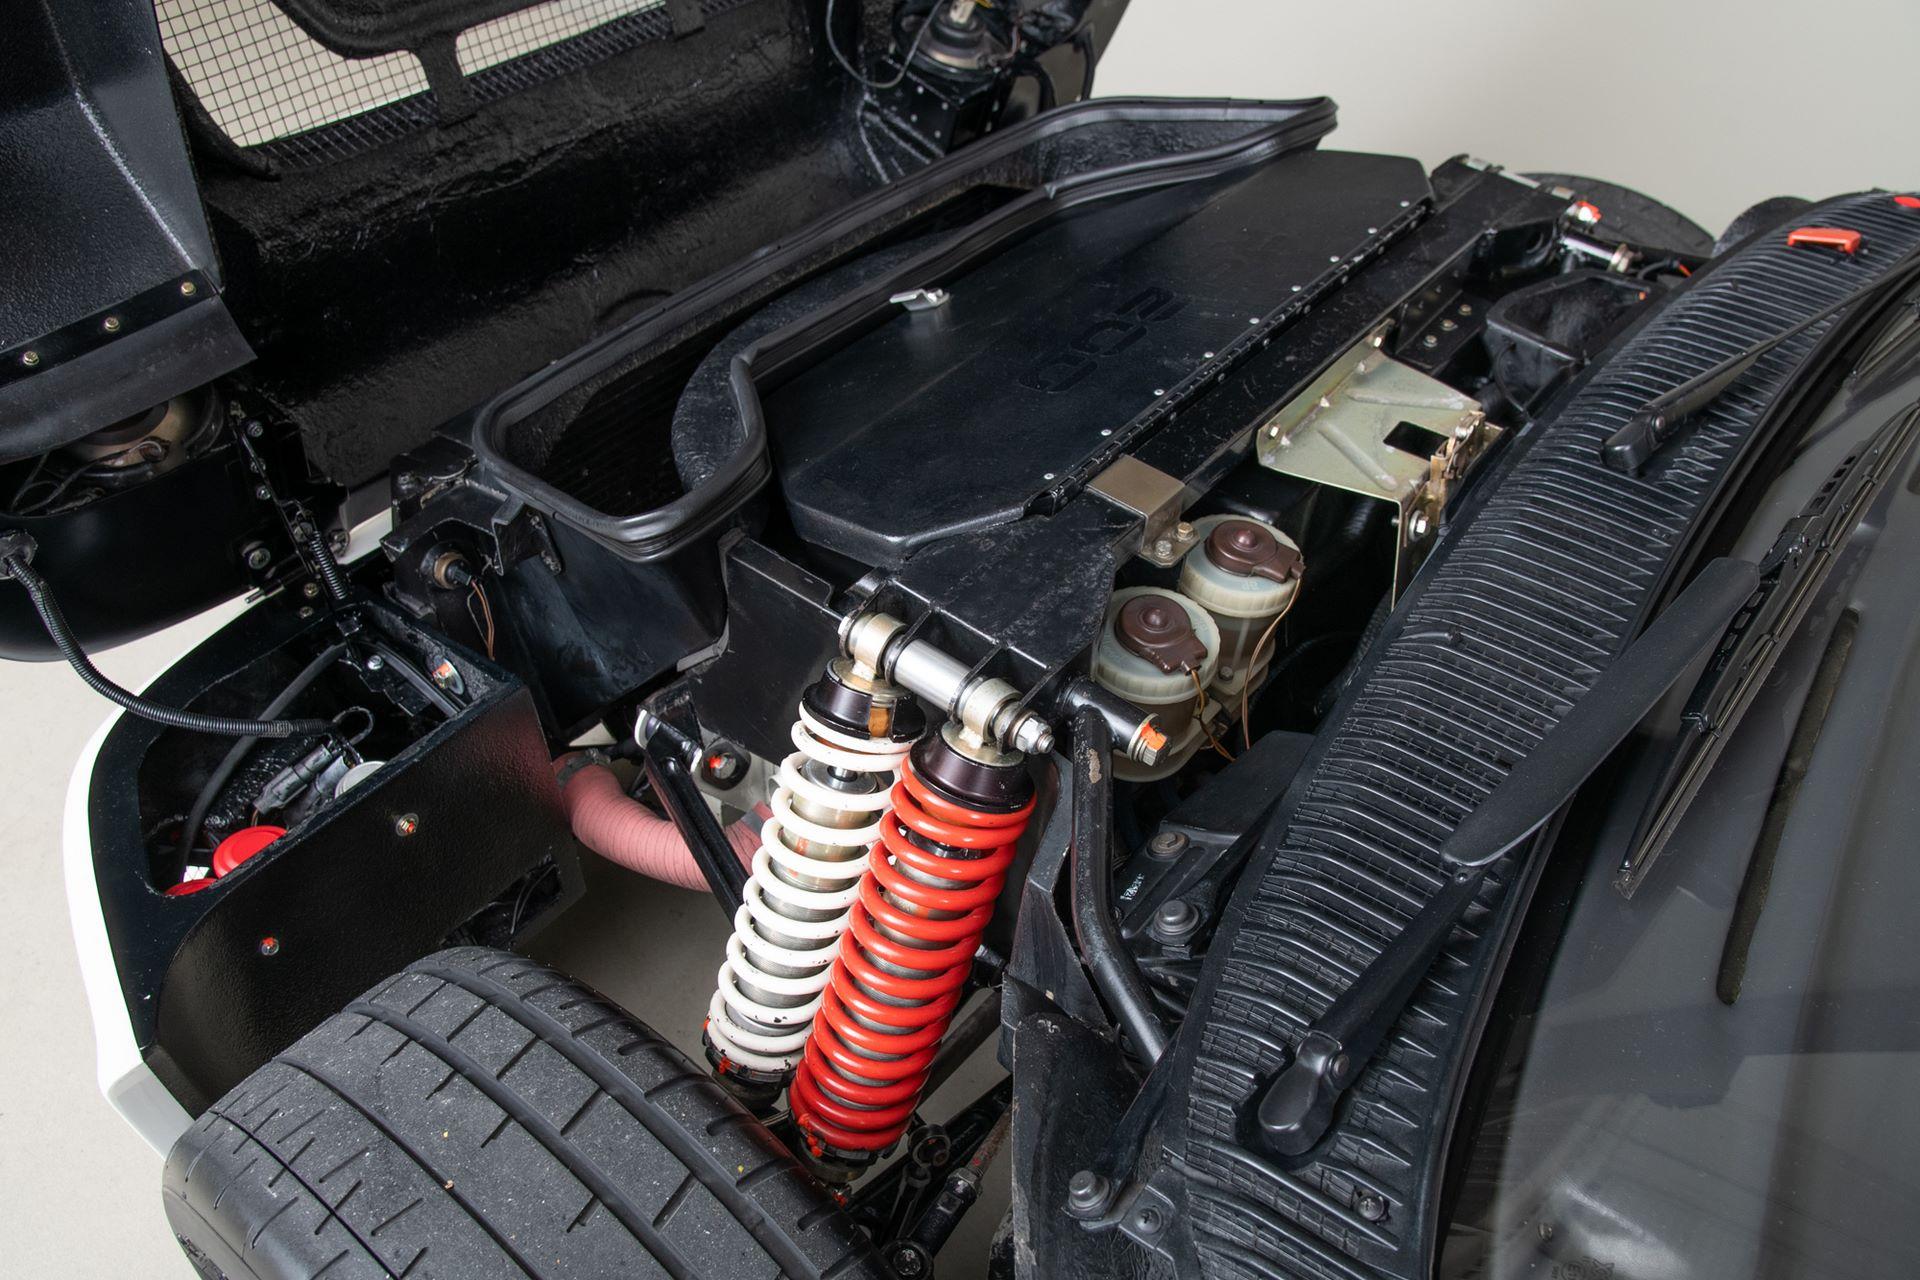 Ford-RS200-Evolution-Evo-for-sale-33